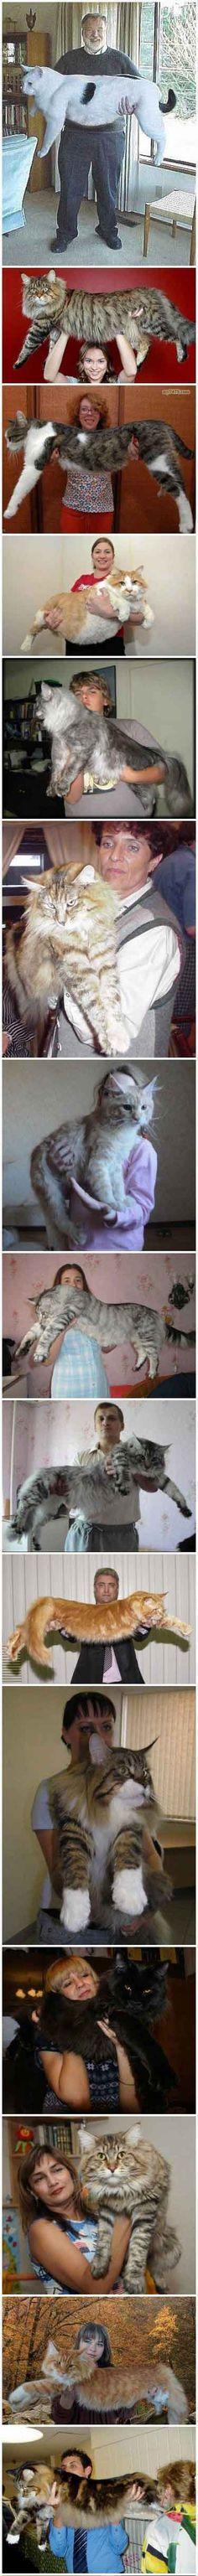 The league of extraodinary big cats